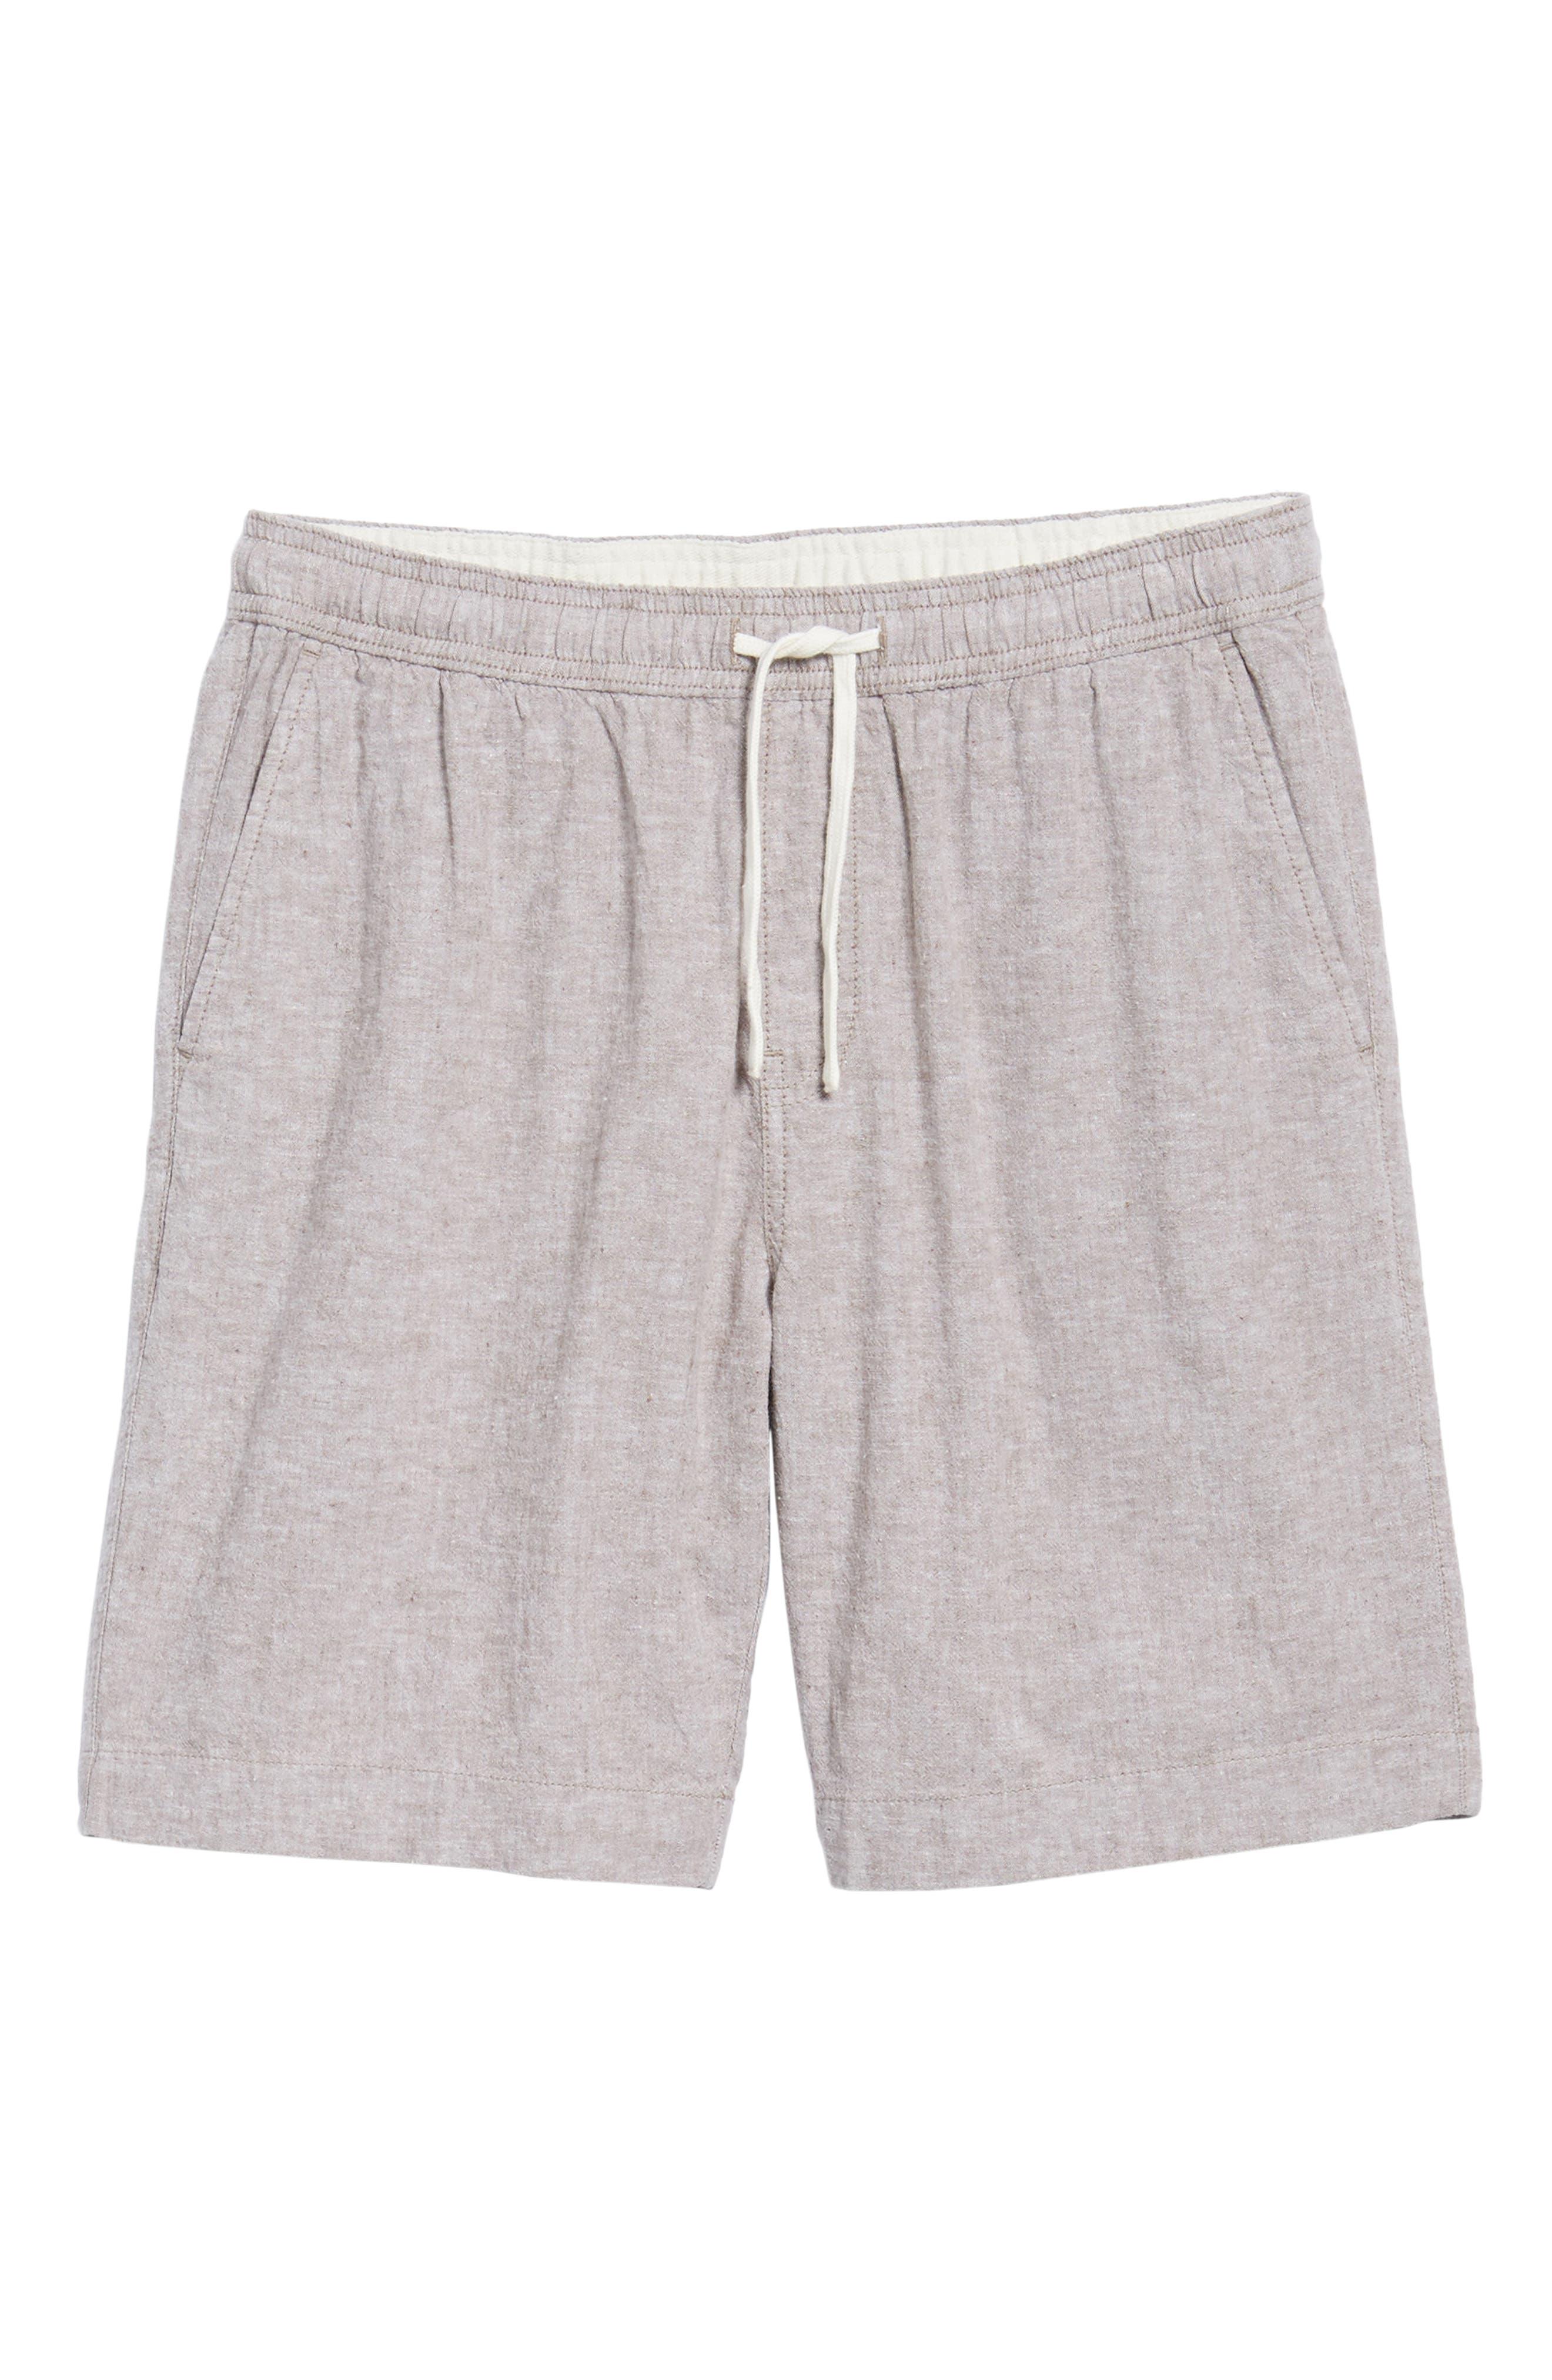 Drawstring Linen Blend Shorts,                             Alternate thumbnail 6, color,                             235